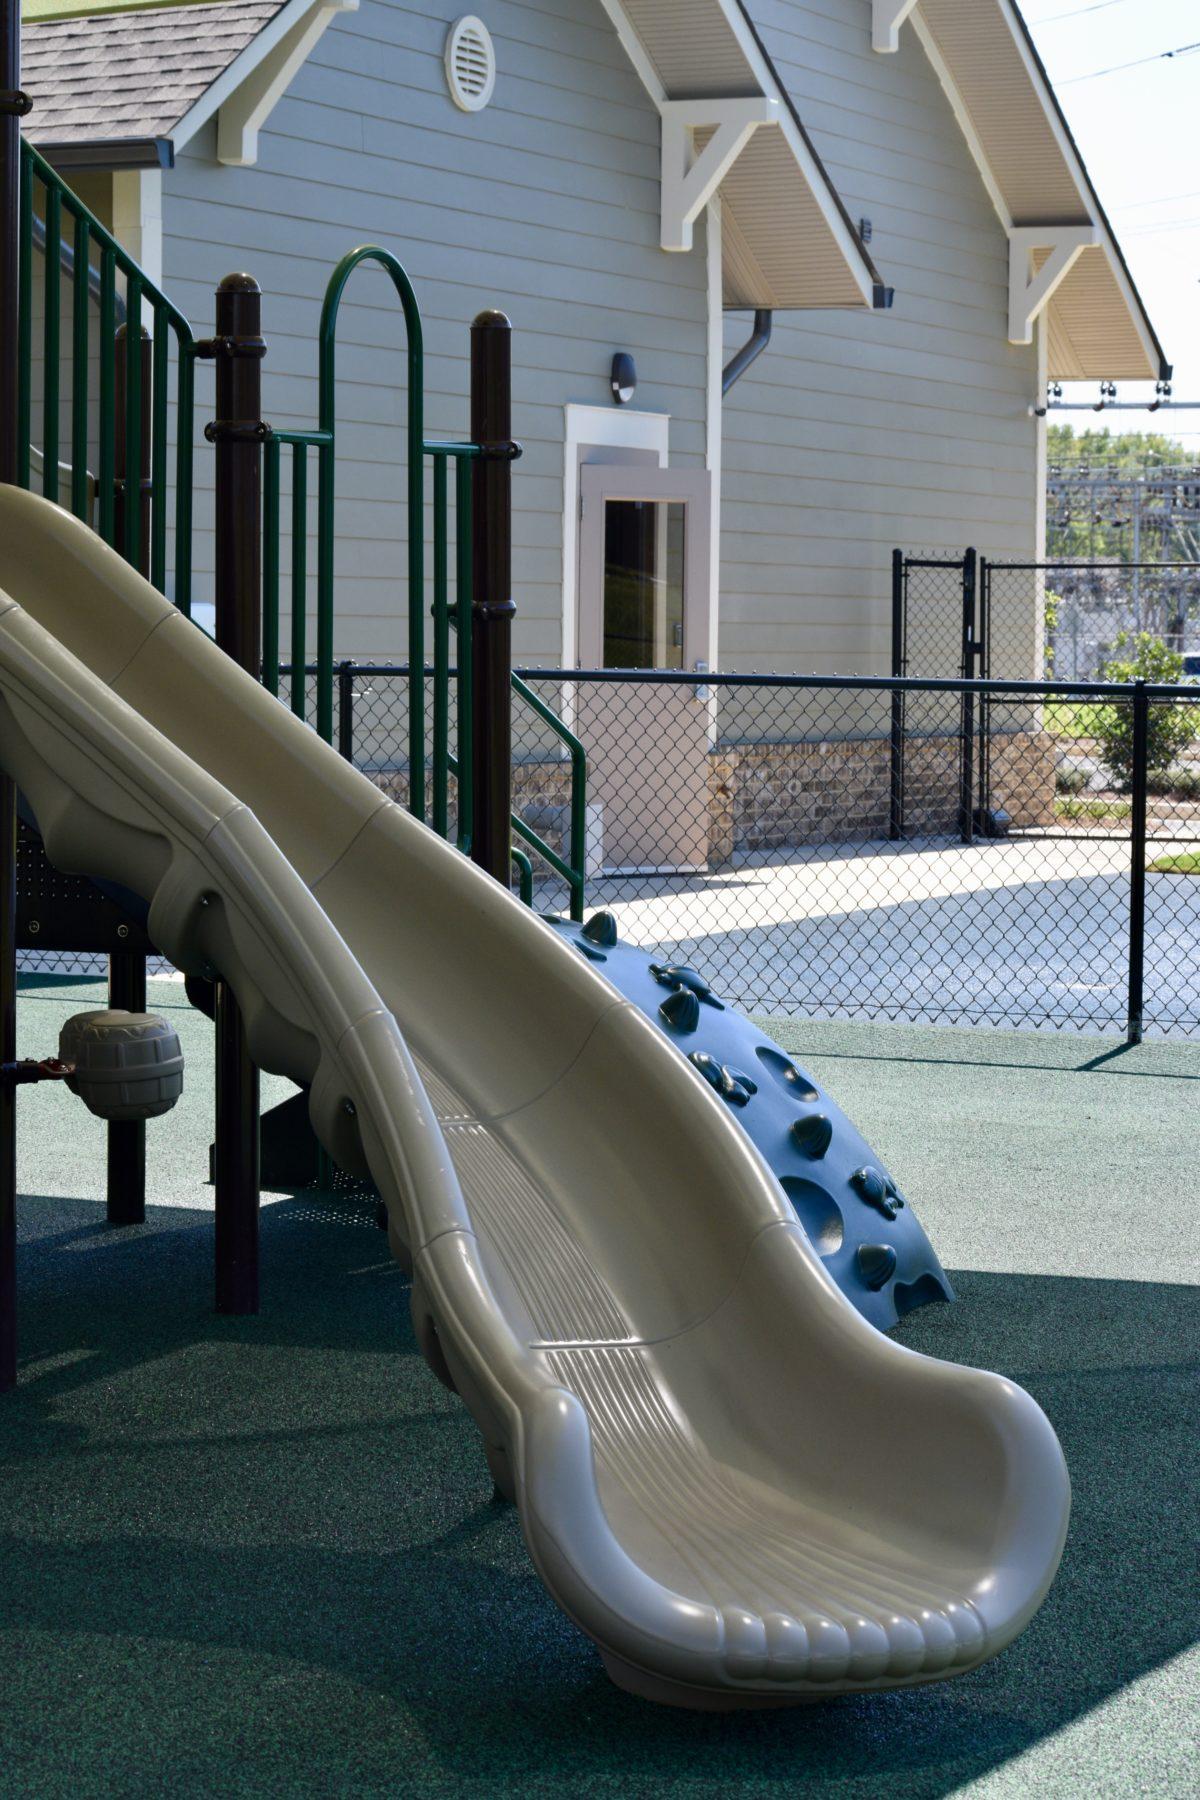 huntsville alabama daycare playground equipment 16